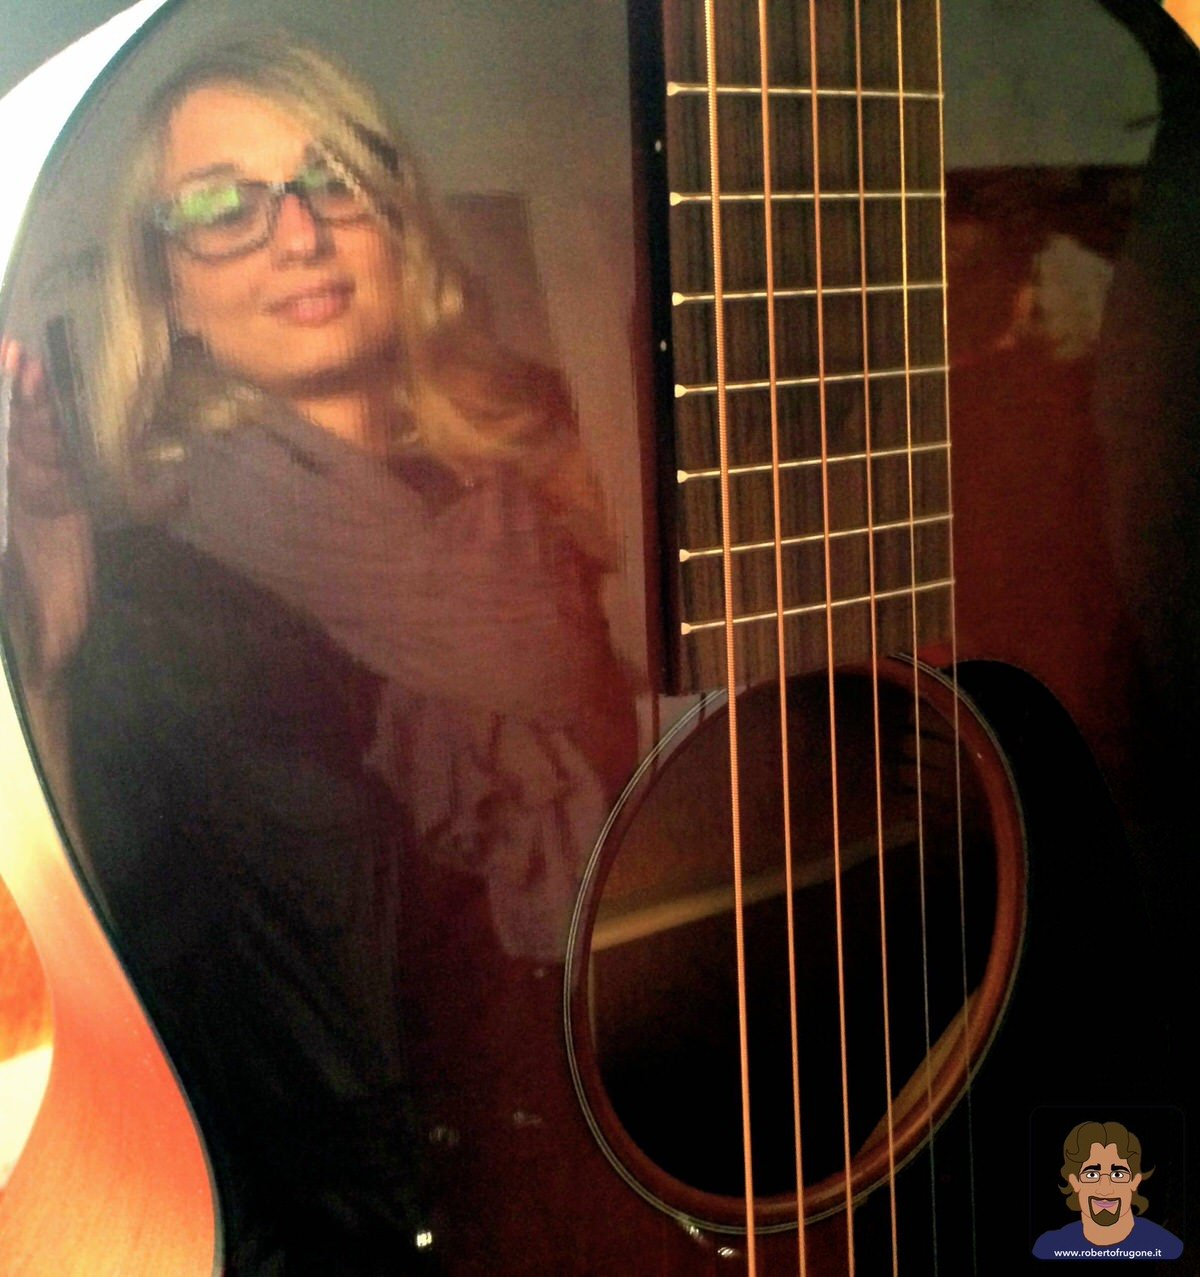 Totem Studio Sala Prove Musicali Casarza Ligure Raffaella Campodonico